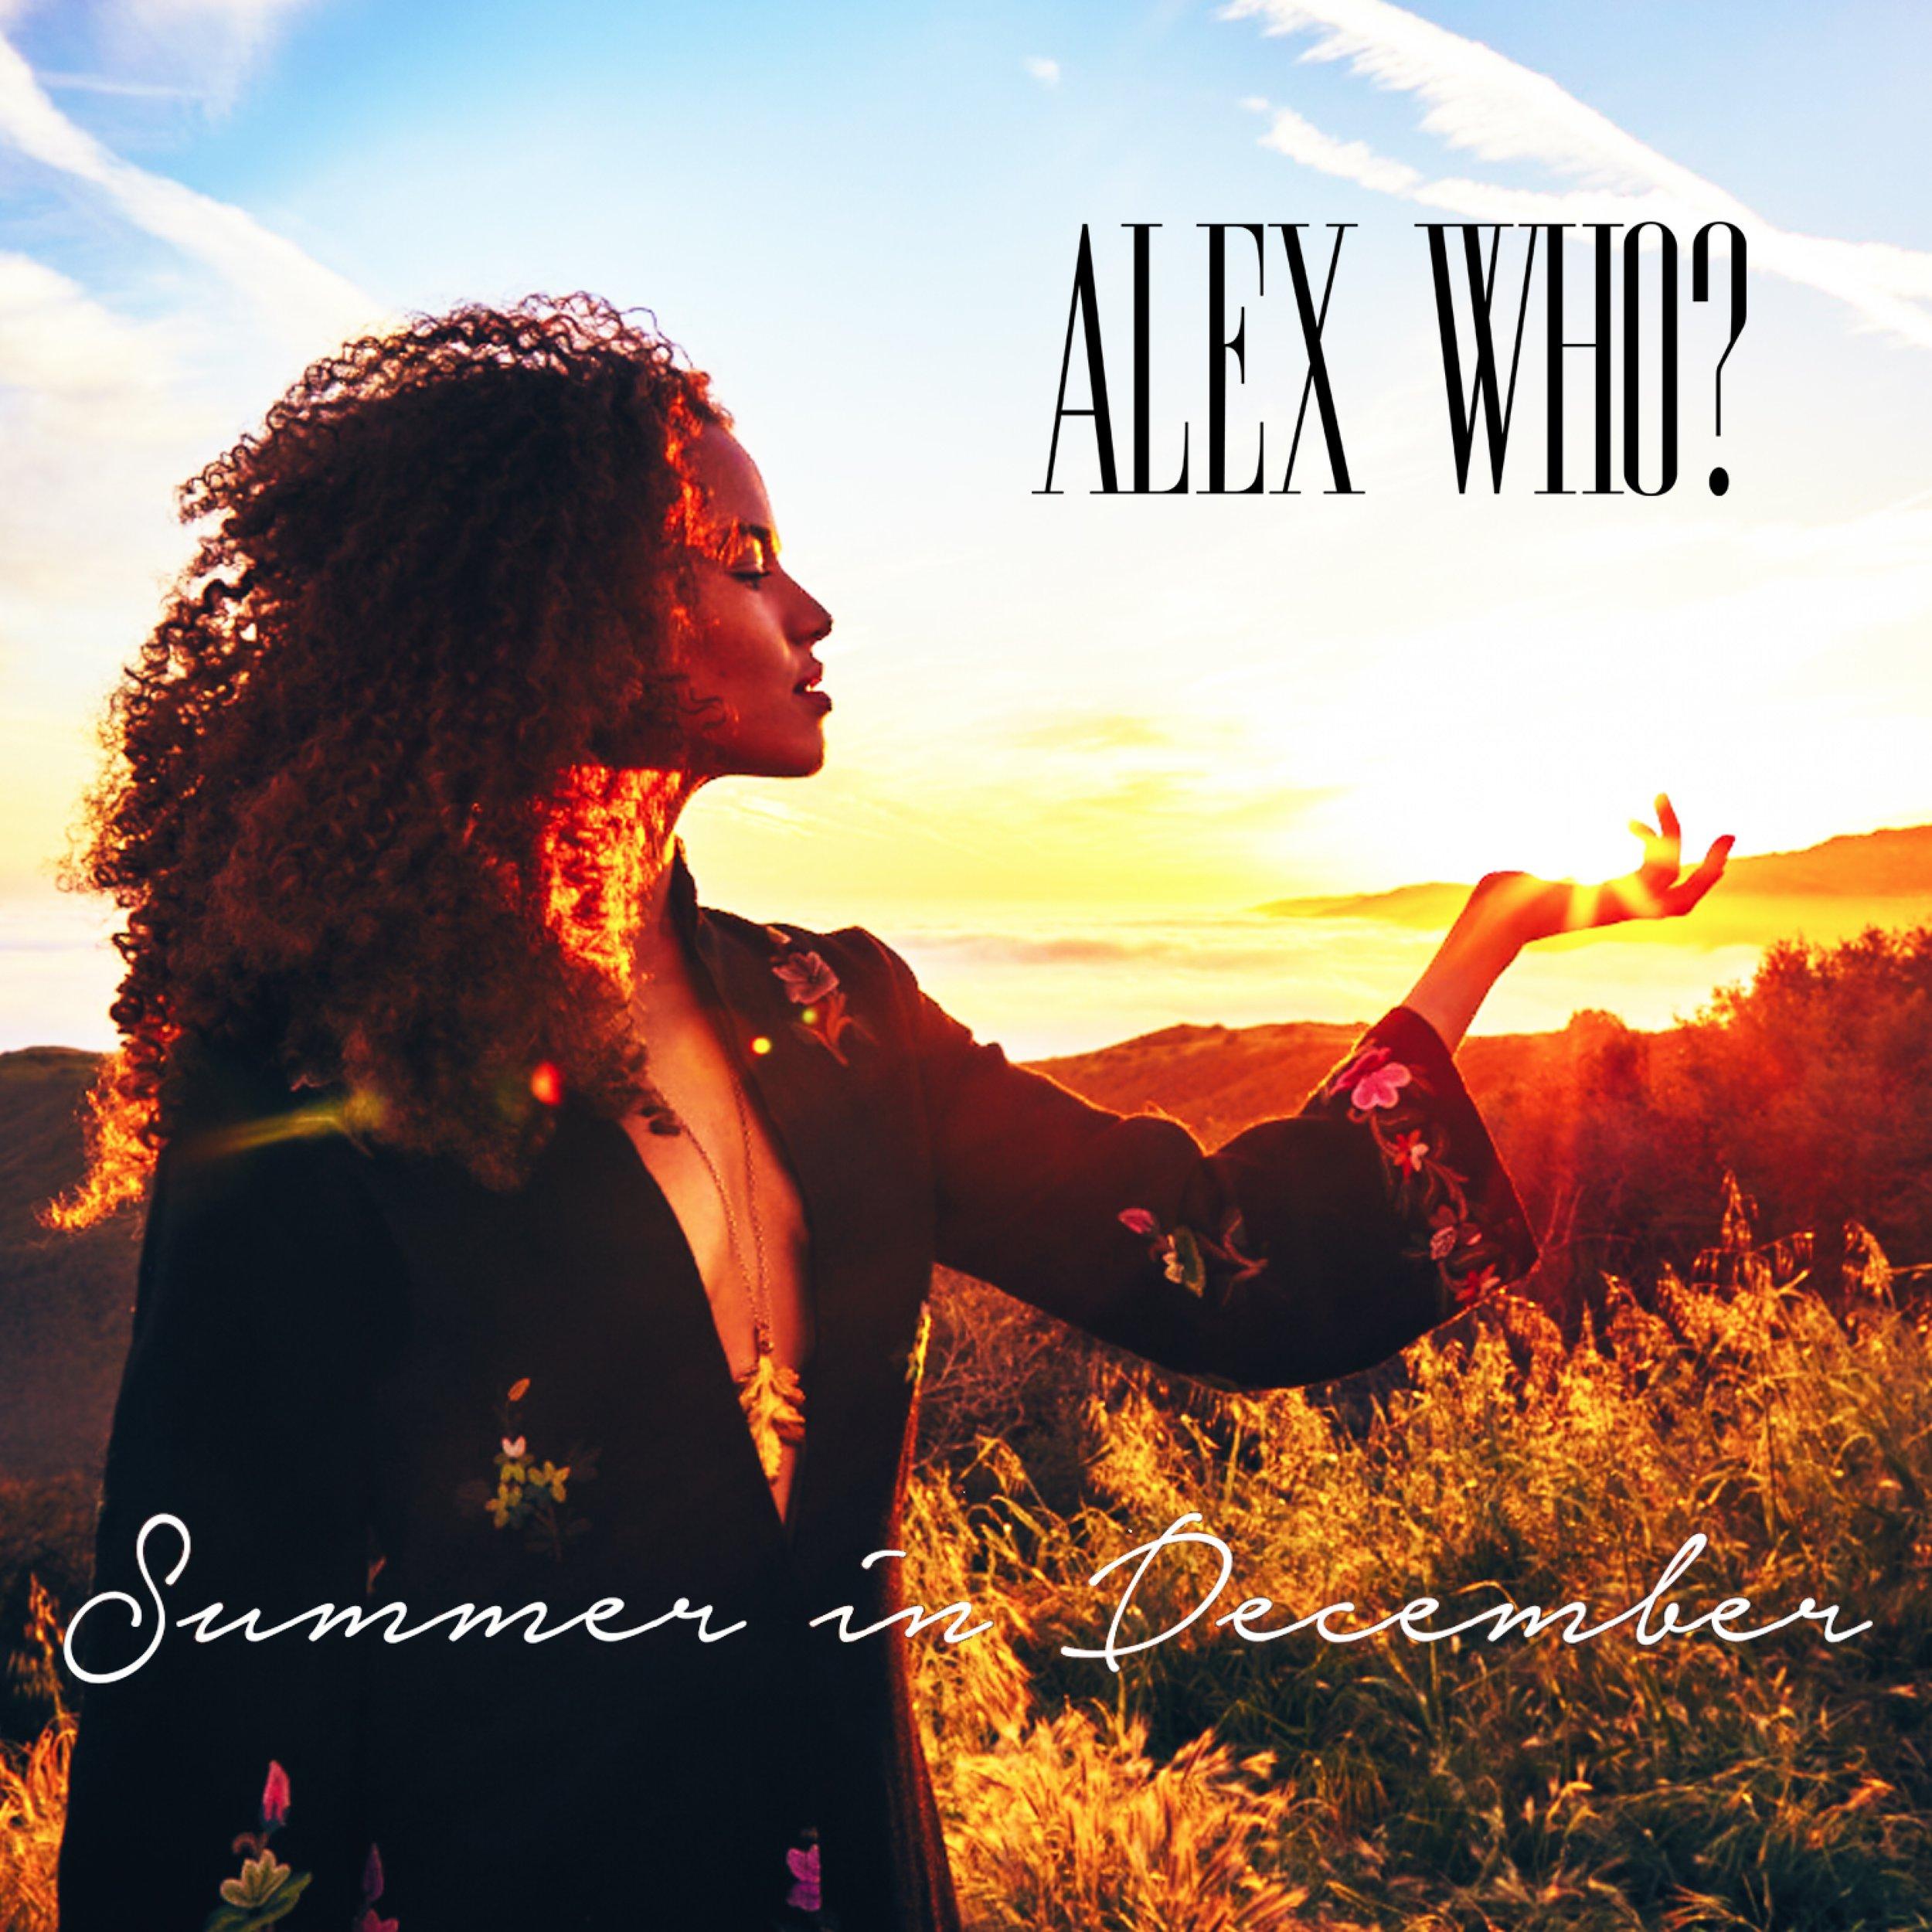 alex-who-summer-in-december-7-1497913247.jpg